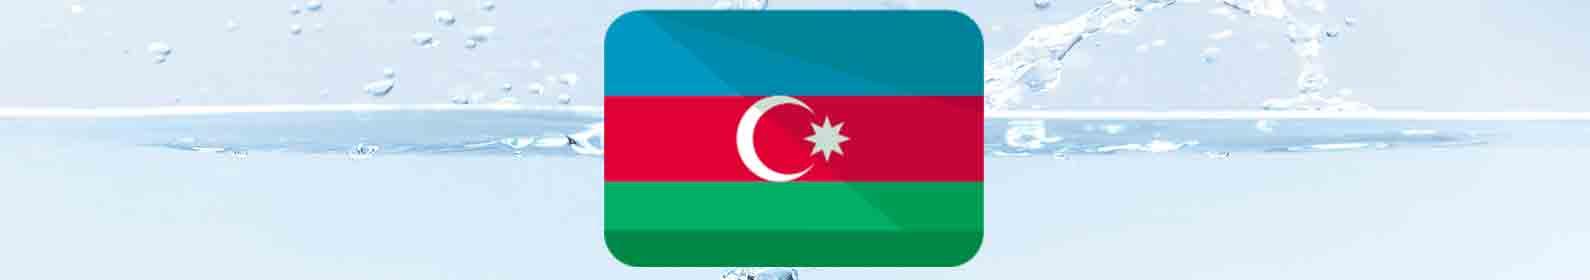 water-treatment-azerbaijan.jpg